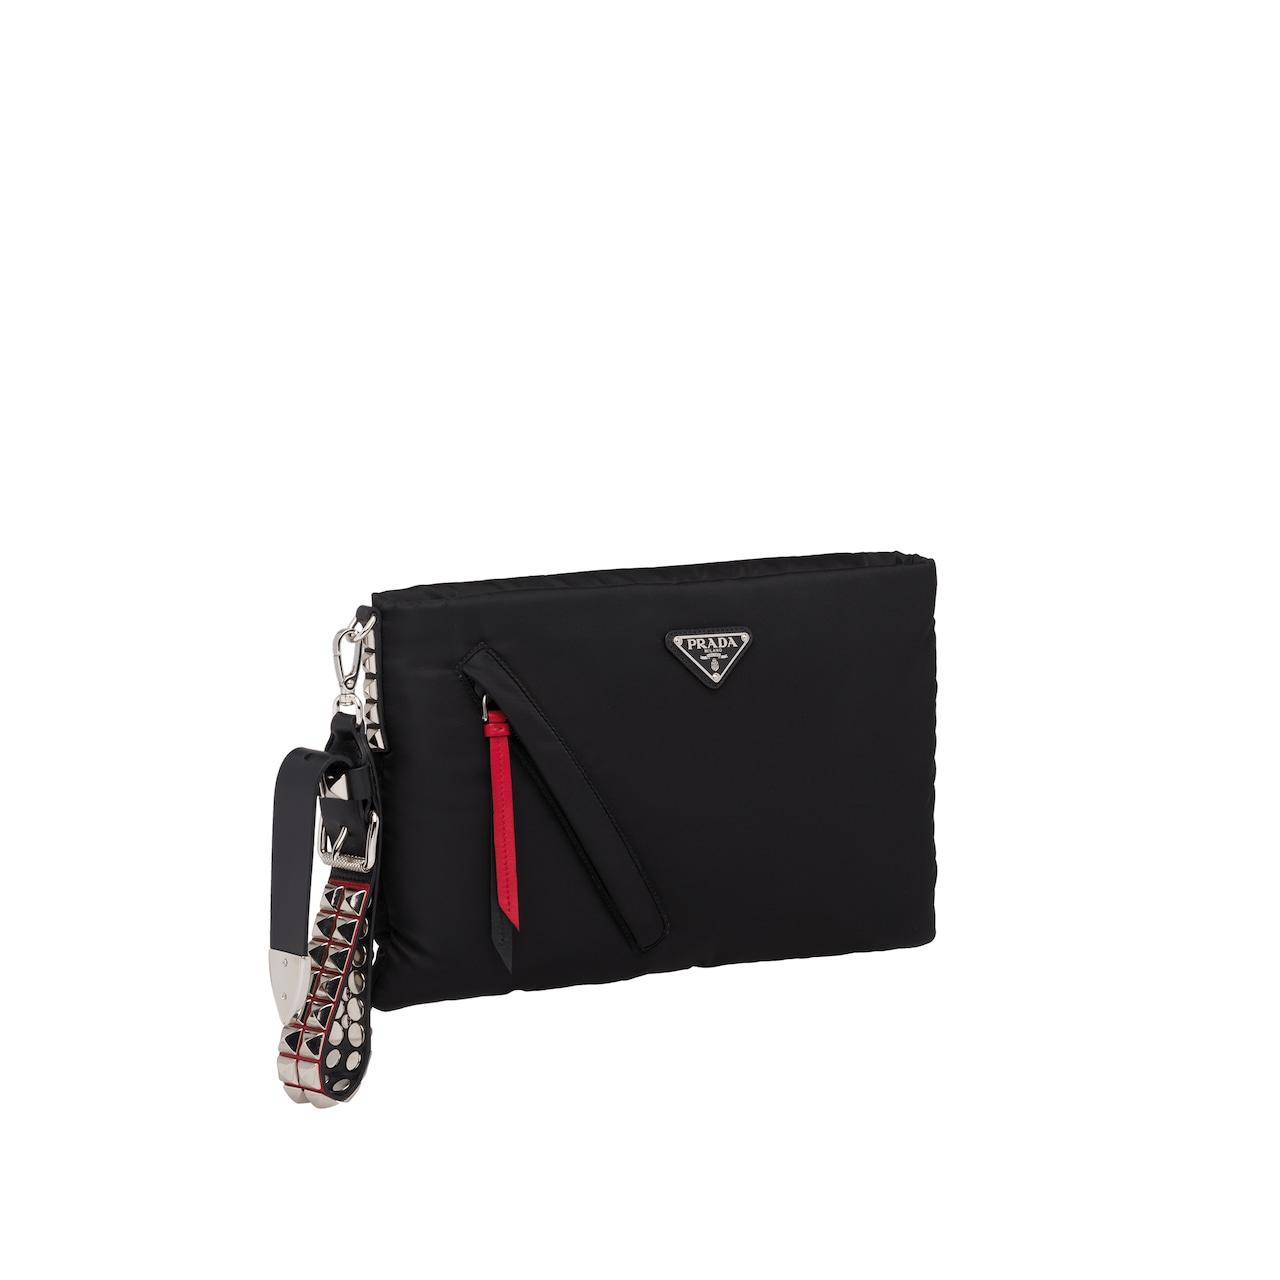 Prada Black nylon clutch with leather and studs 3